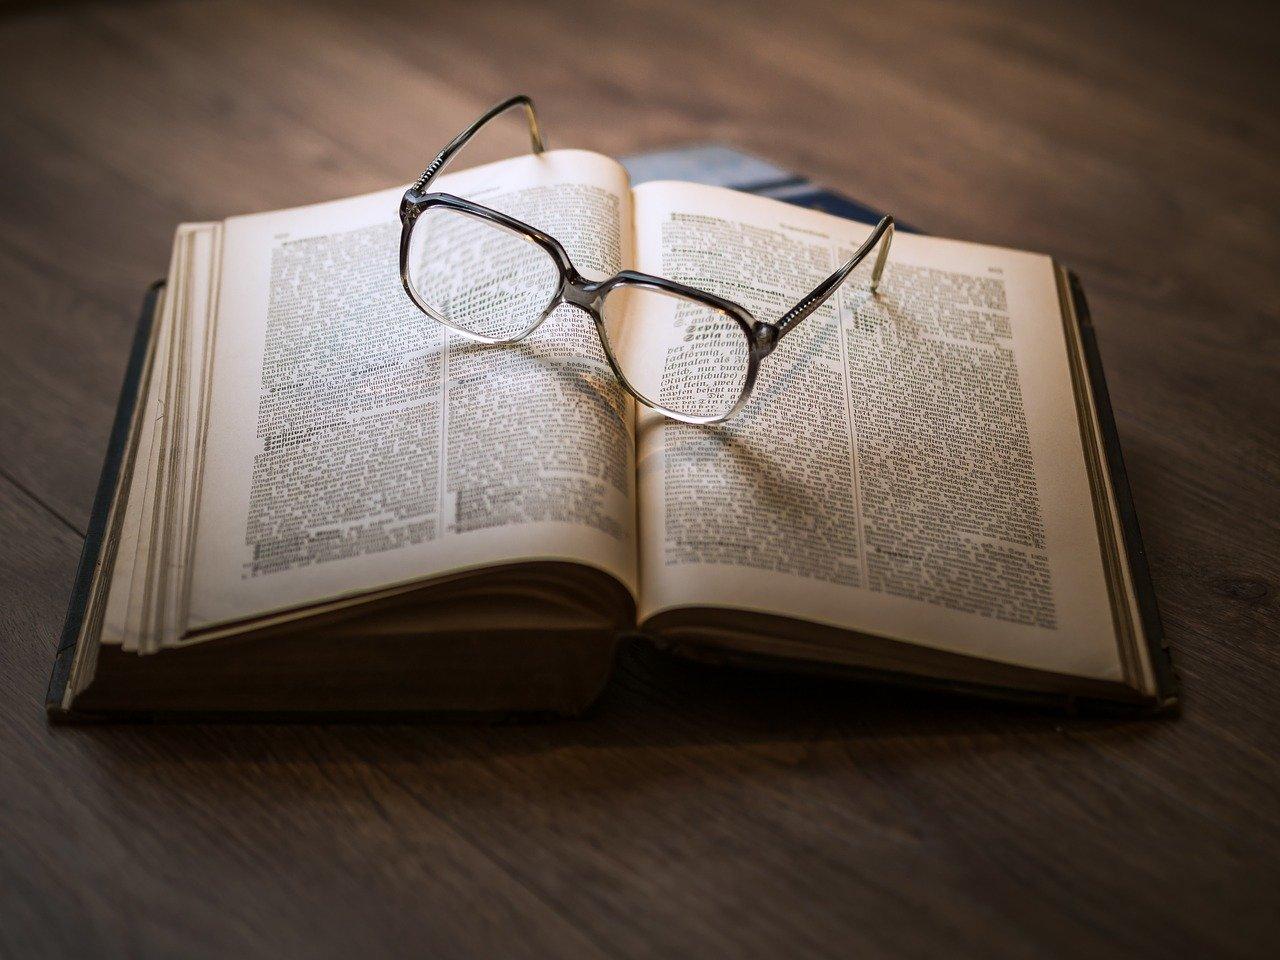 【WordPress】WordPressの勉強を始めるのにおすすめの本10選